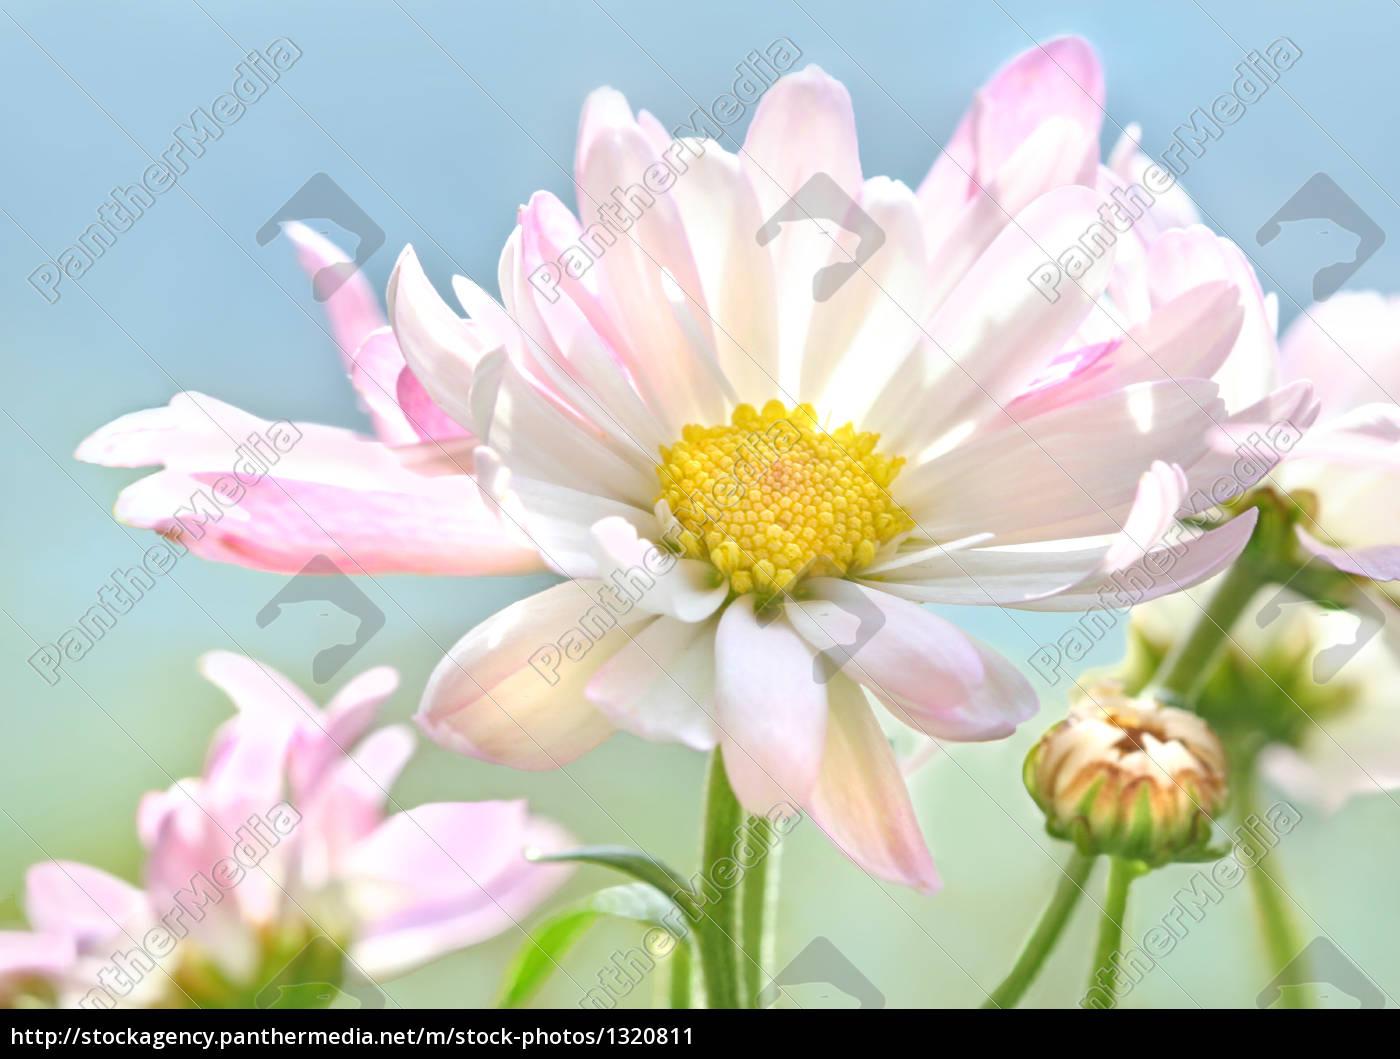 chrysanthemums - 1320811